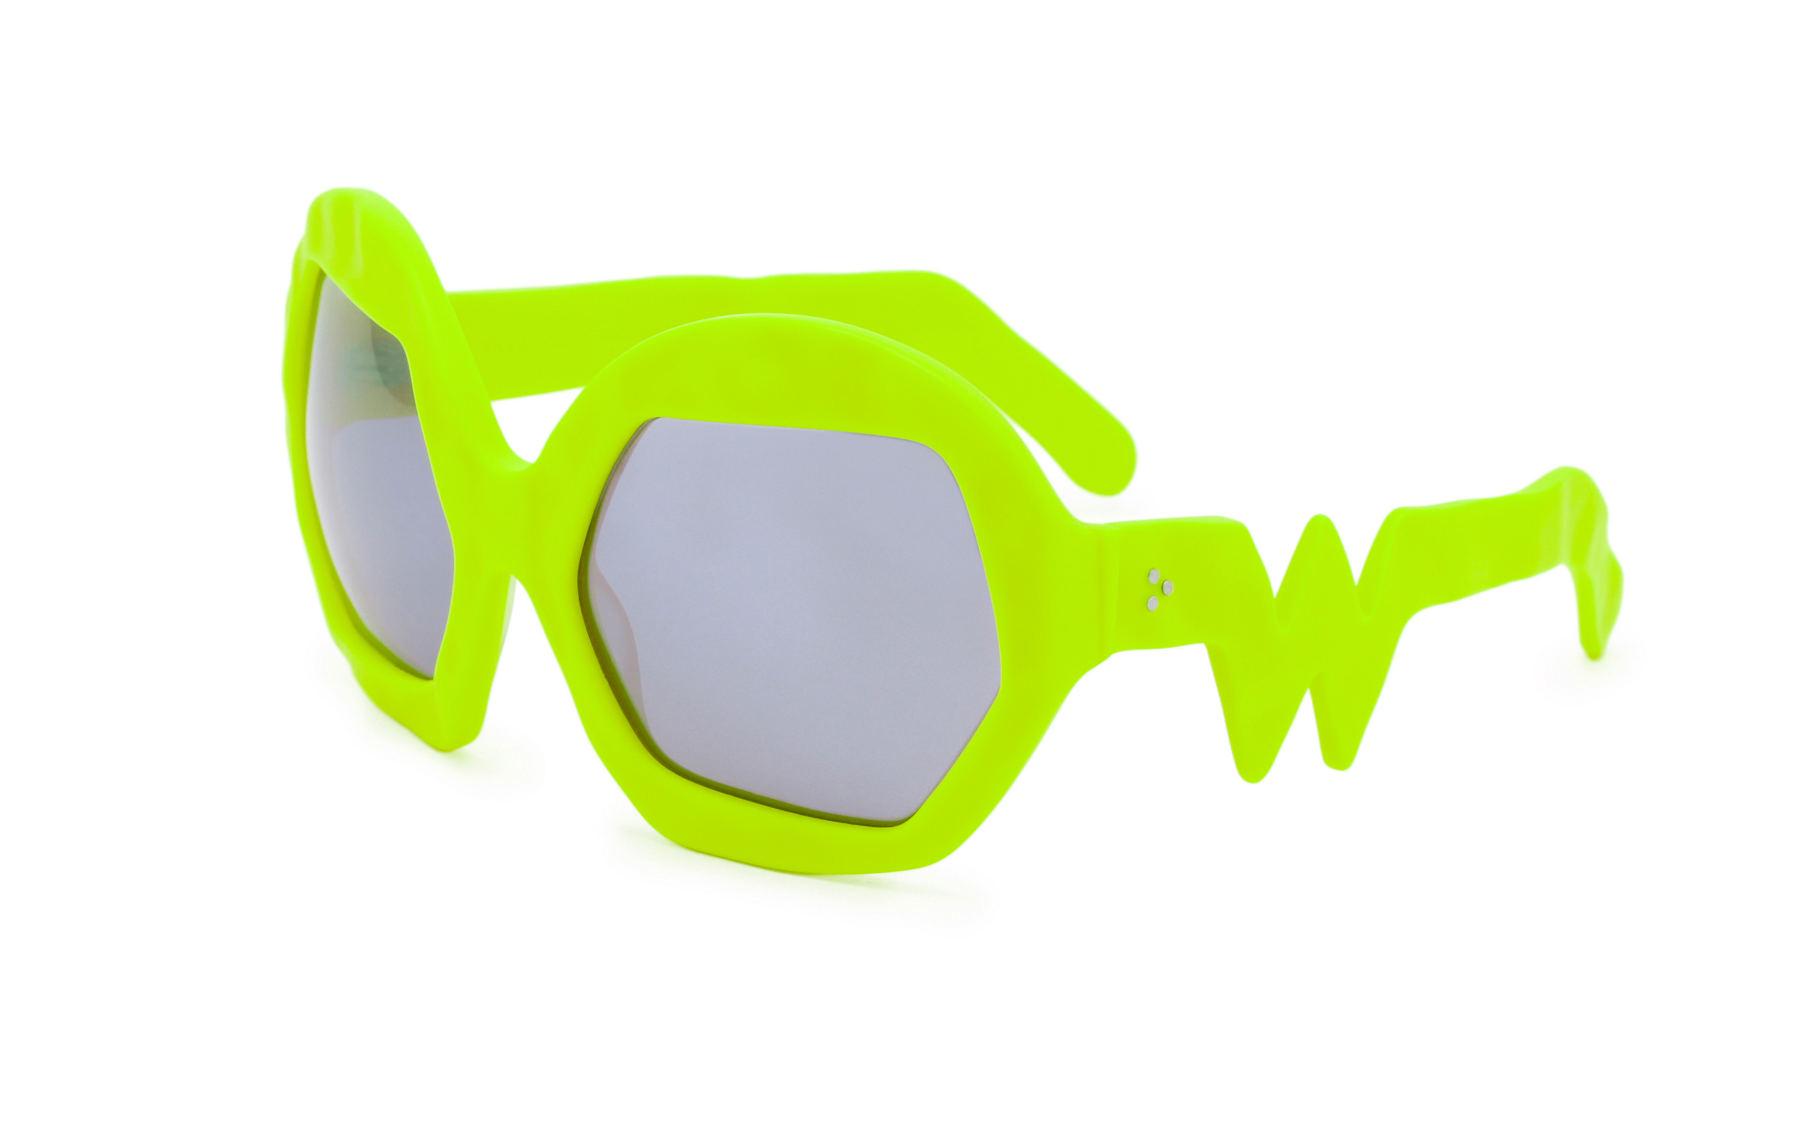 FAKBYFAK x Walter Van Beirendonck  Donder Sunglasses. Neon Yellow Code: FBF-09-14-07